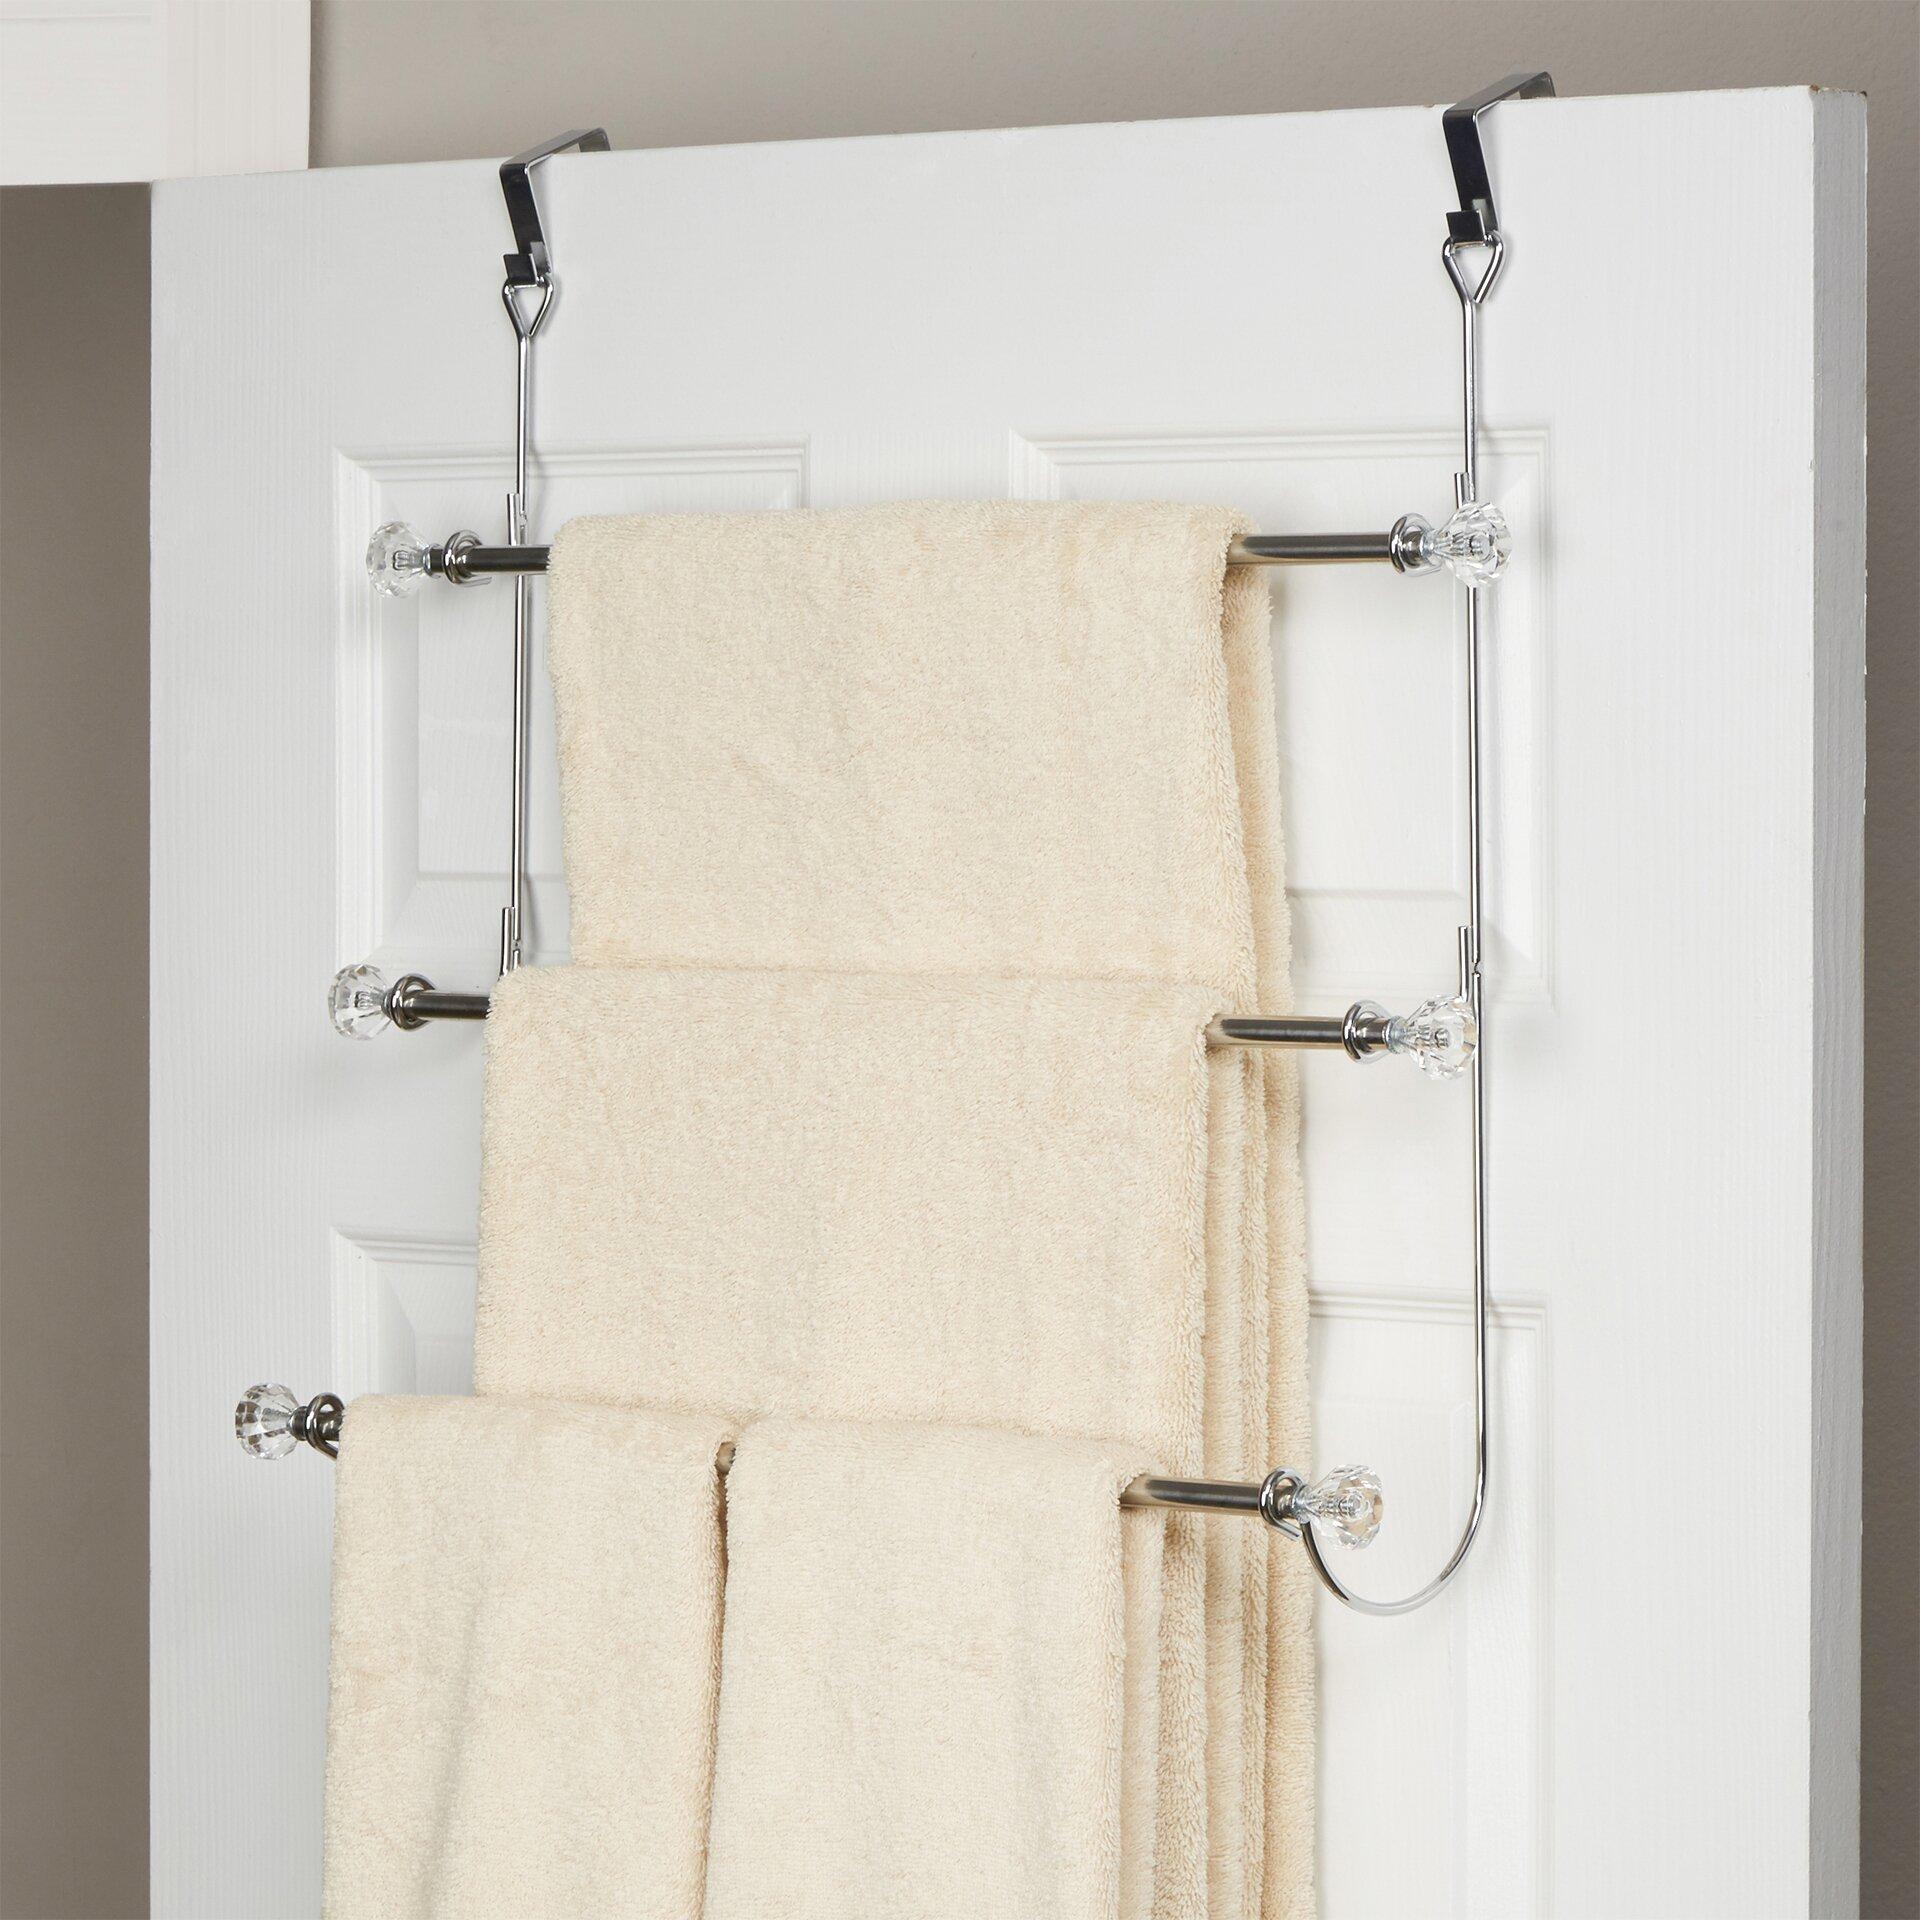 Wayfair Basics Wayfair Basics 3 Tier Over The Door Towel